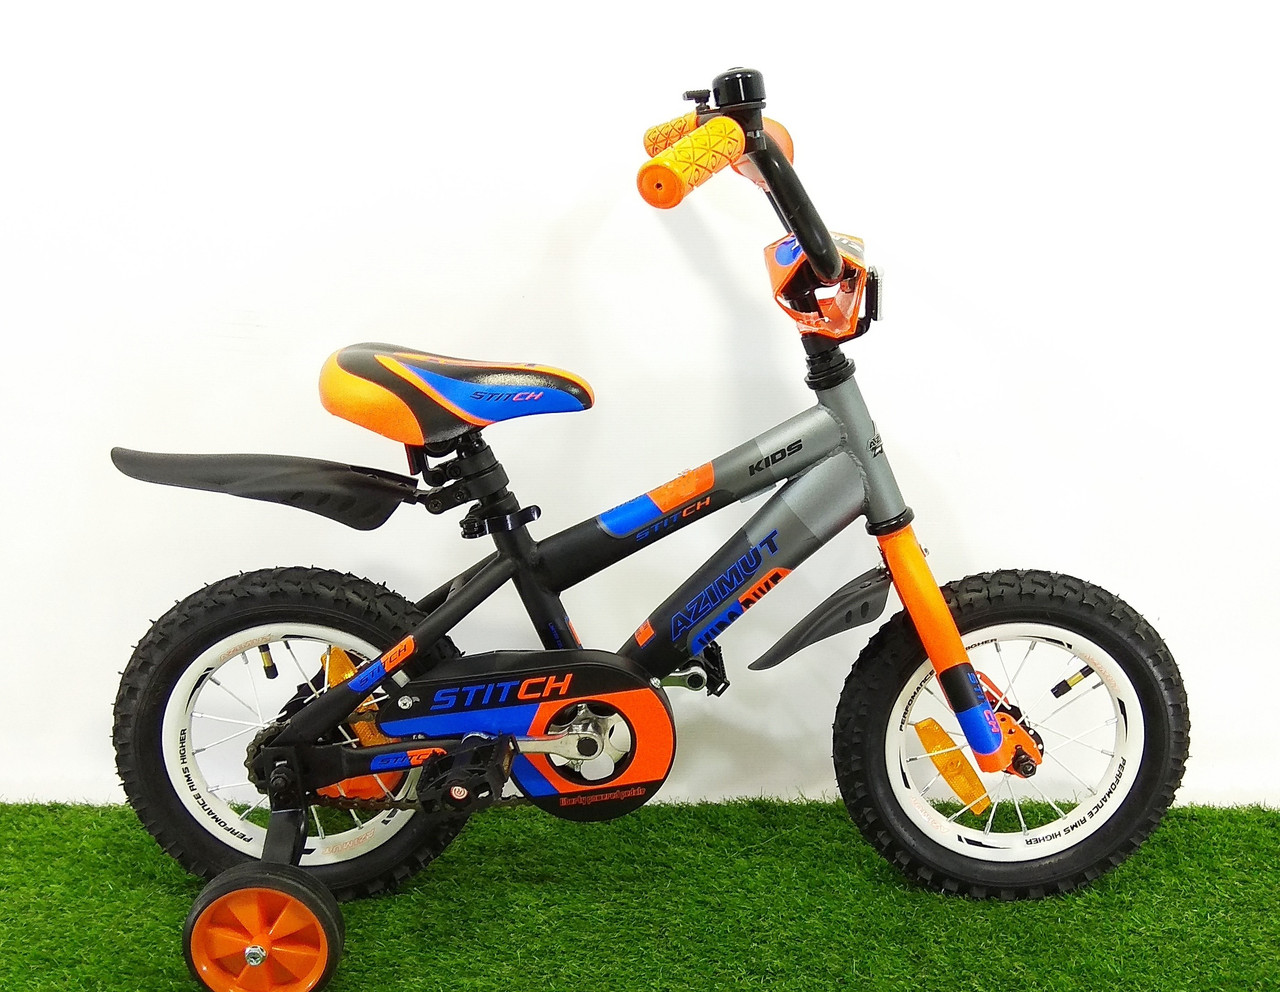 "Дитячий велосипед Azimut Stitch 14"""